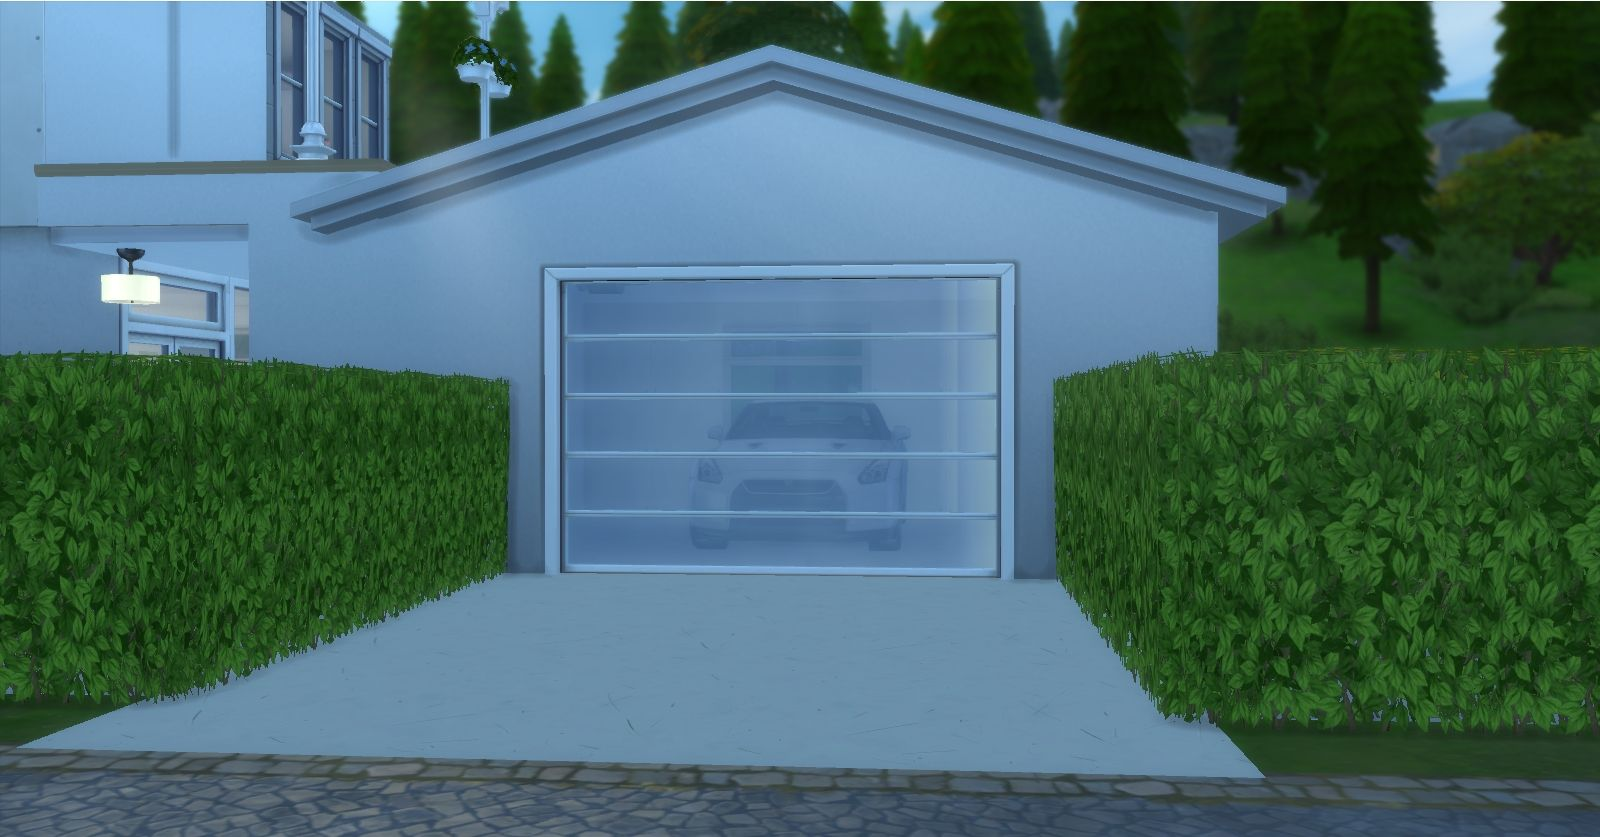 Mod The Sims Garages Sims Sims 4 Garage Doors